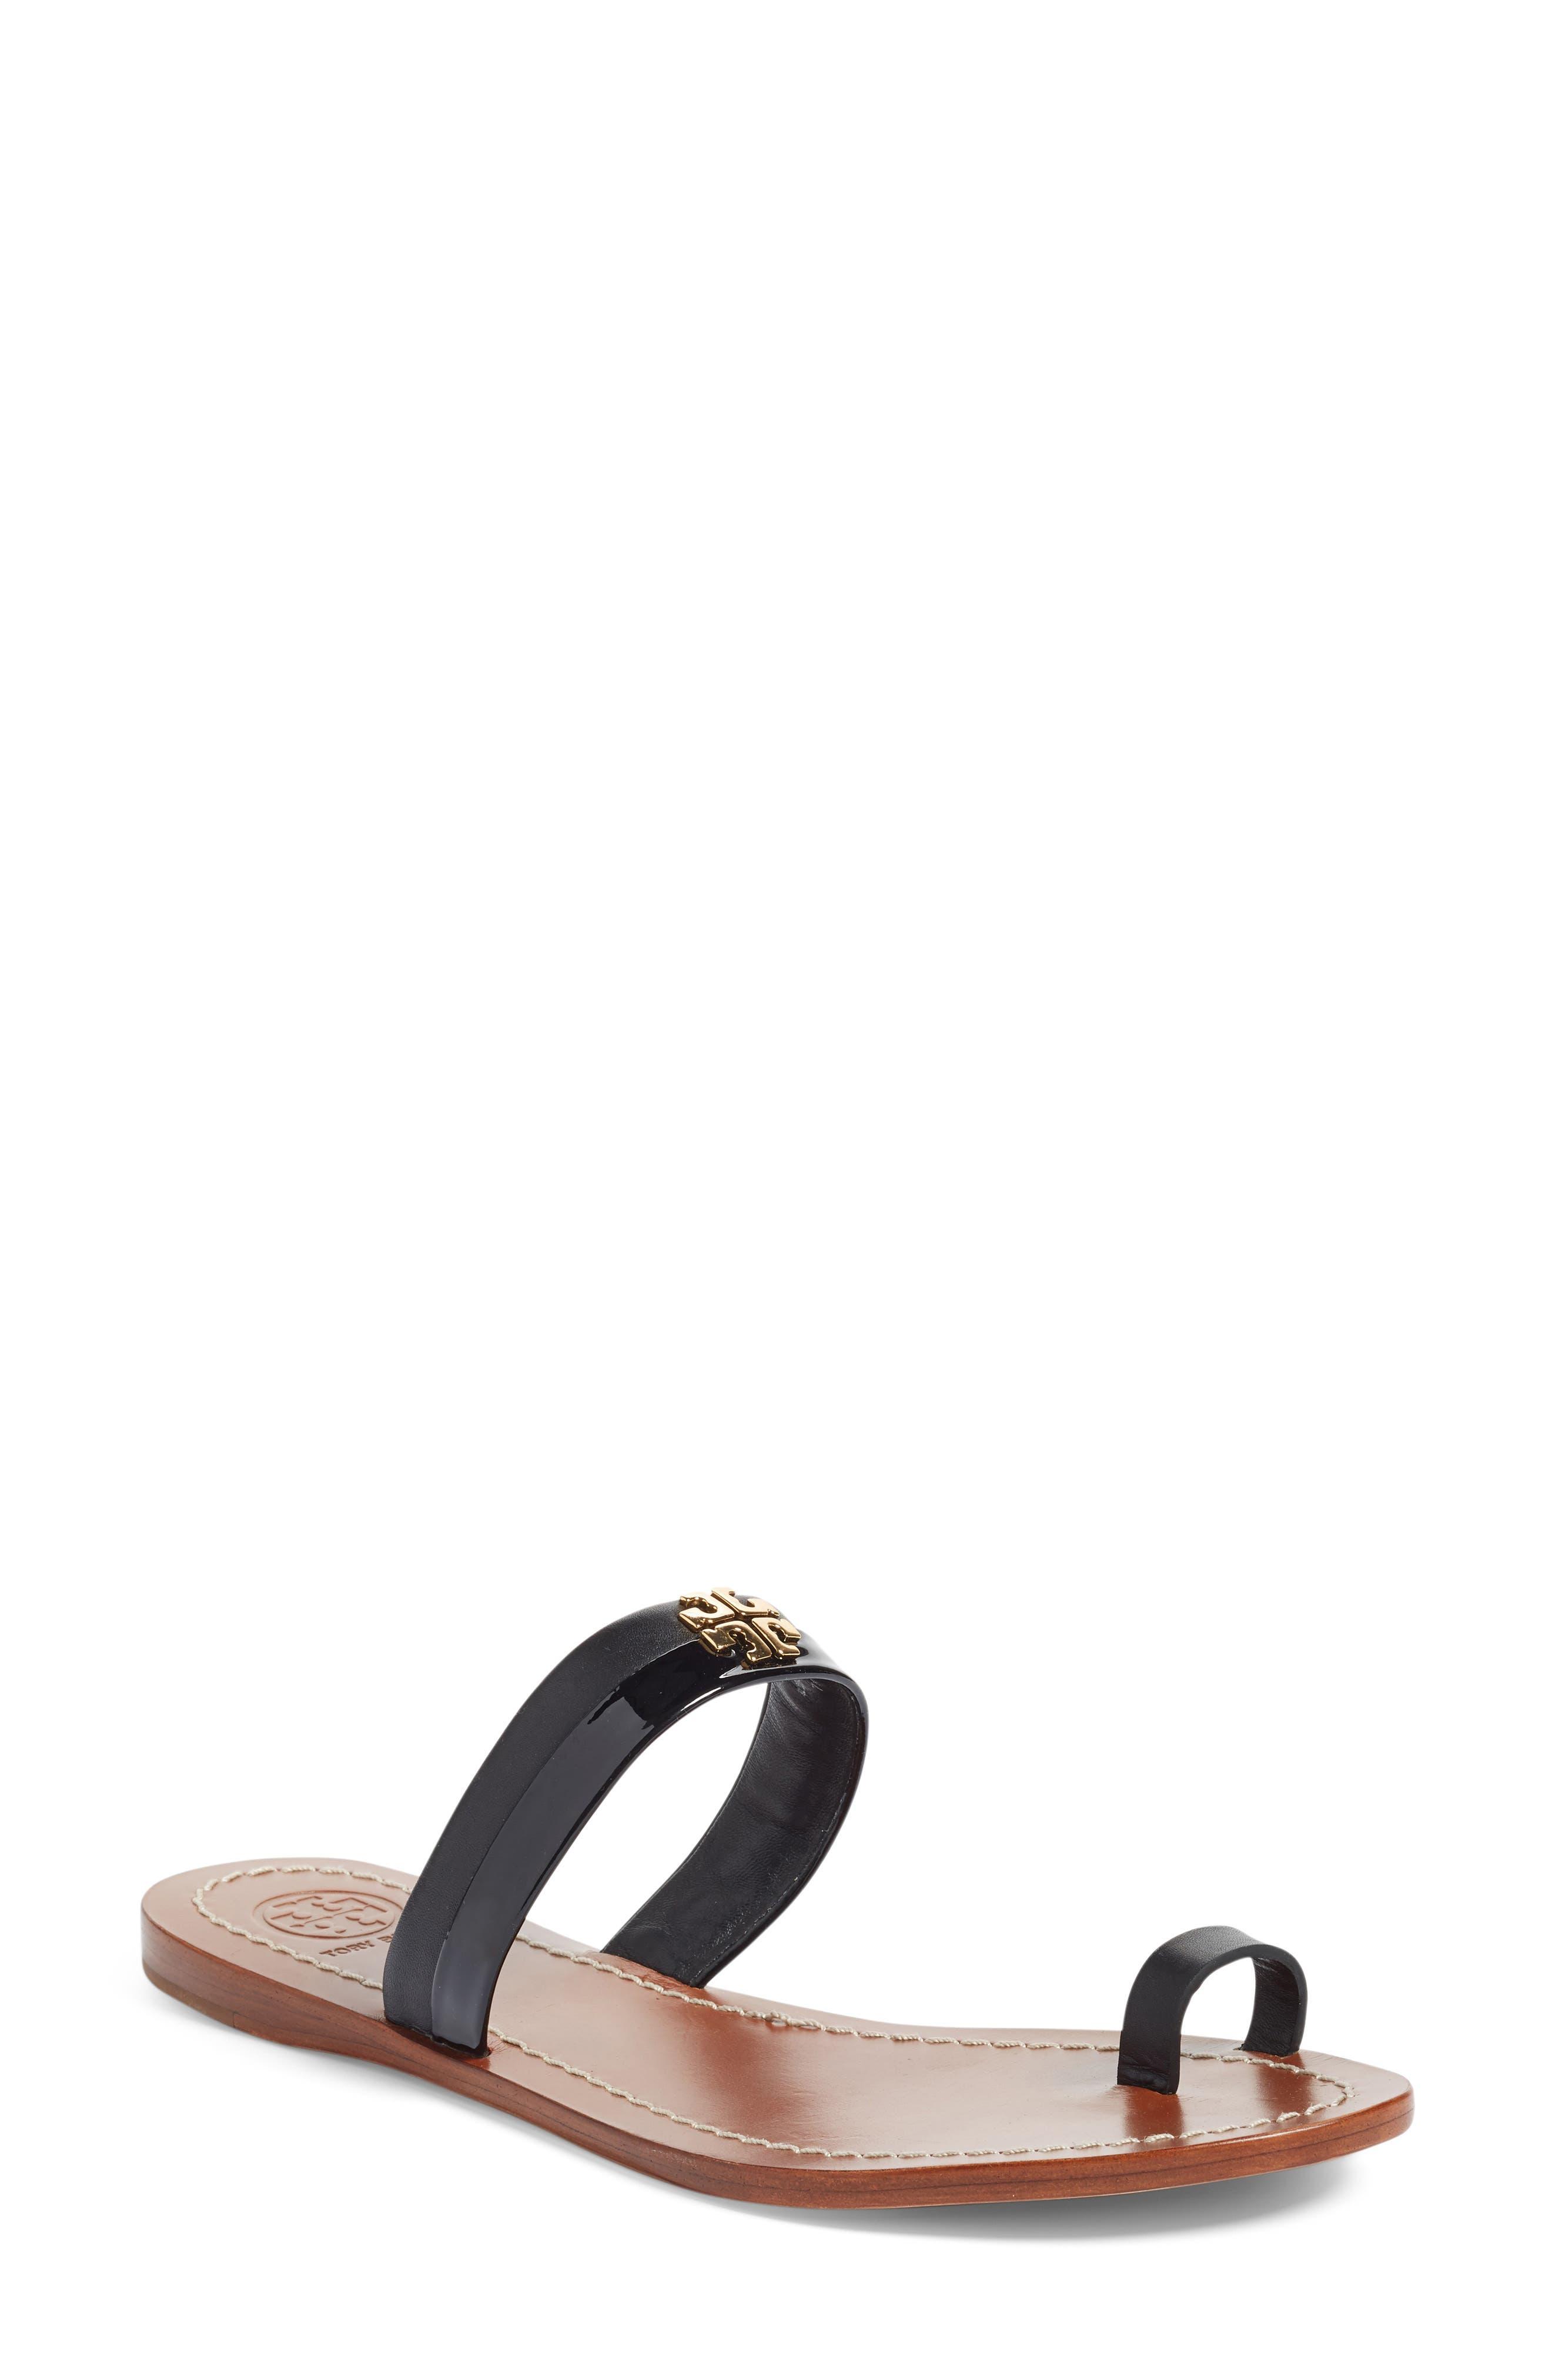 Jolie Toe Ring Sandal,                         Main,                         color, 001